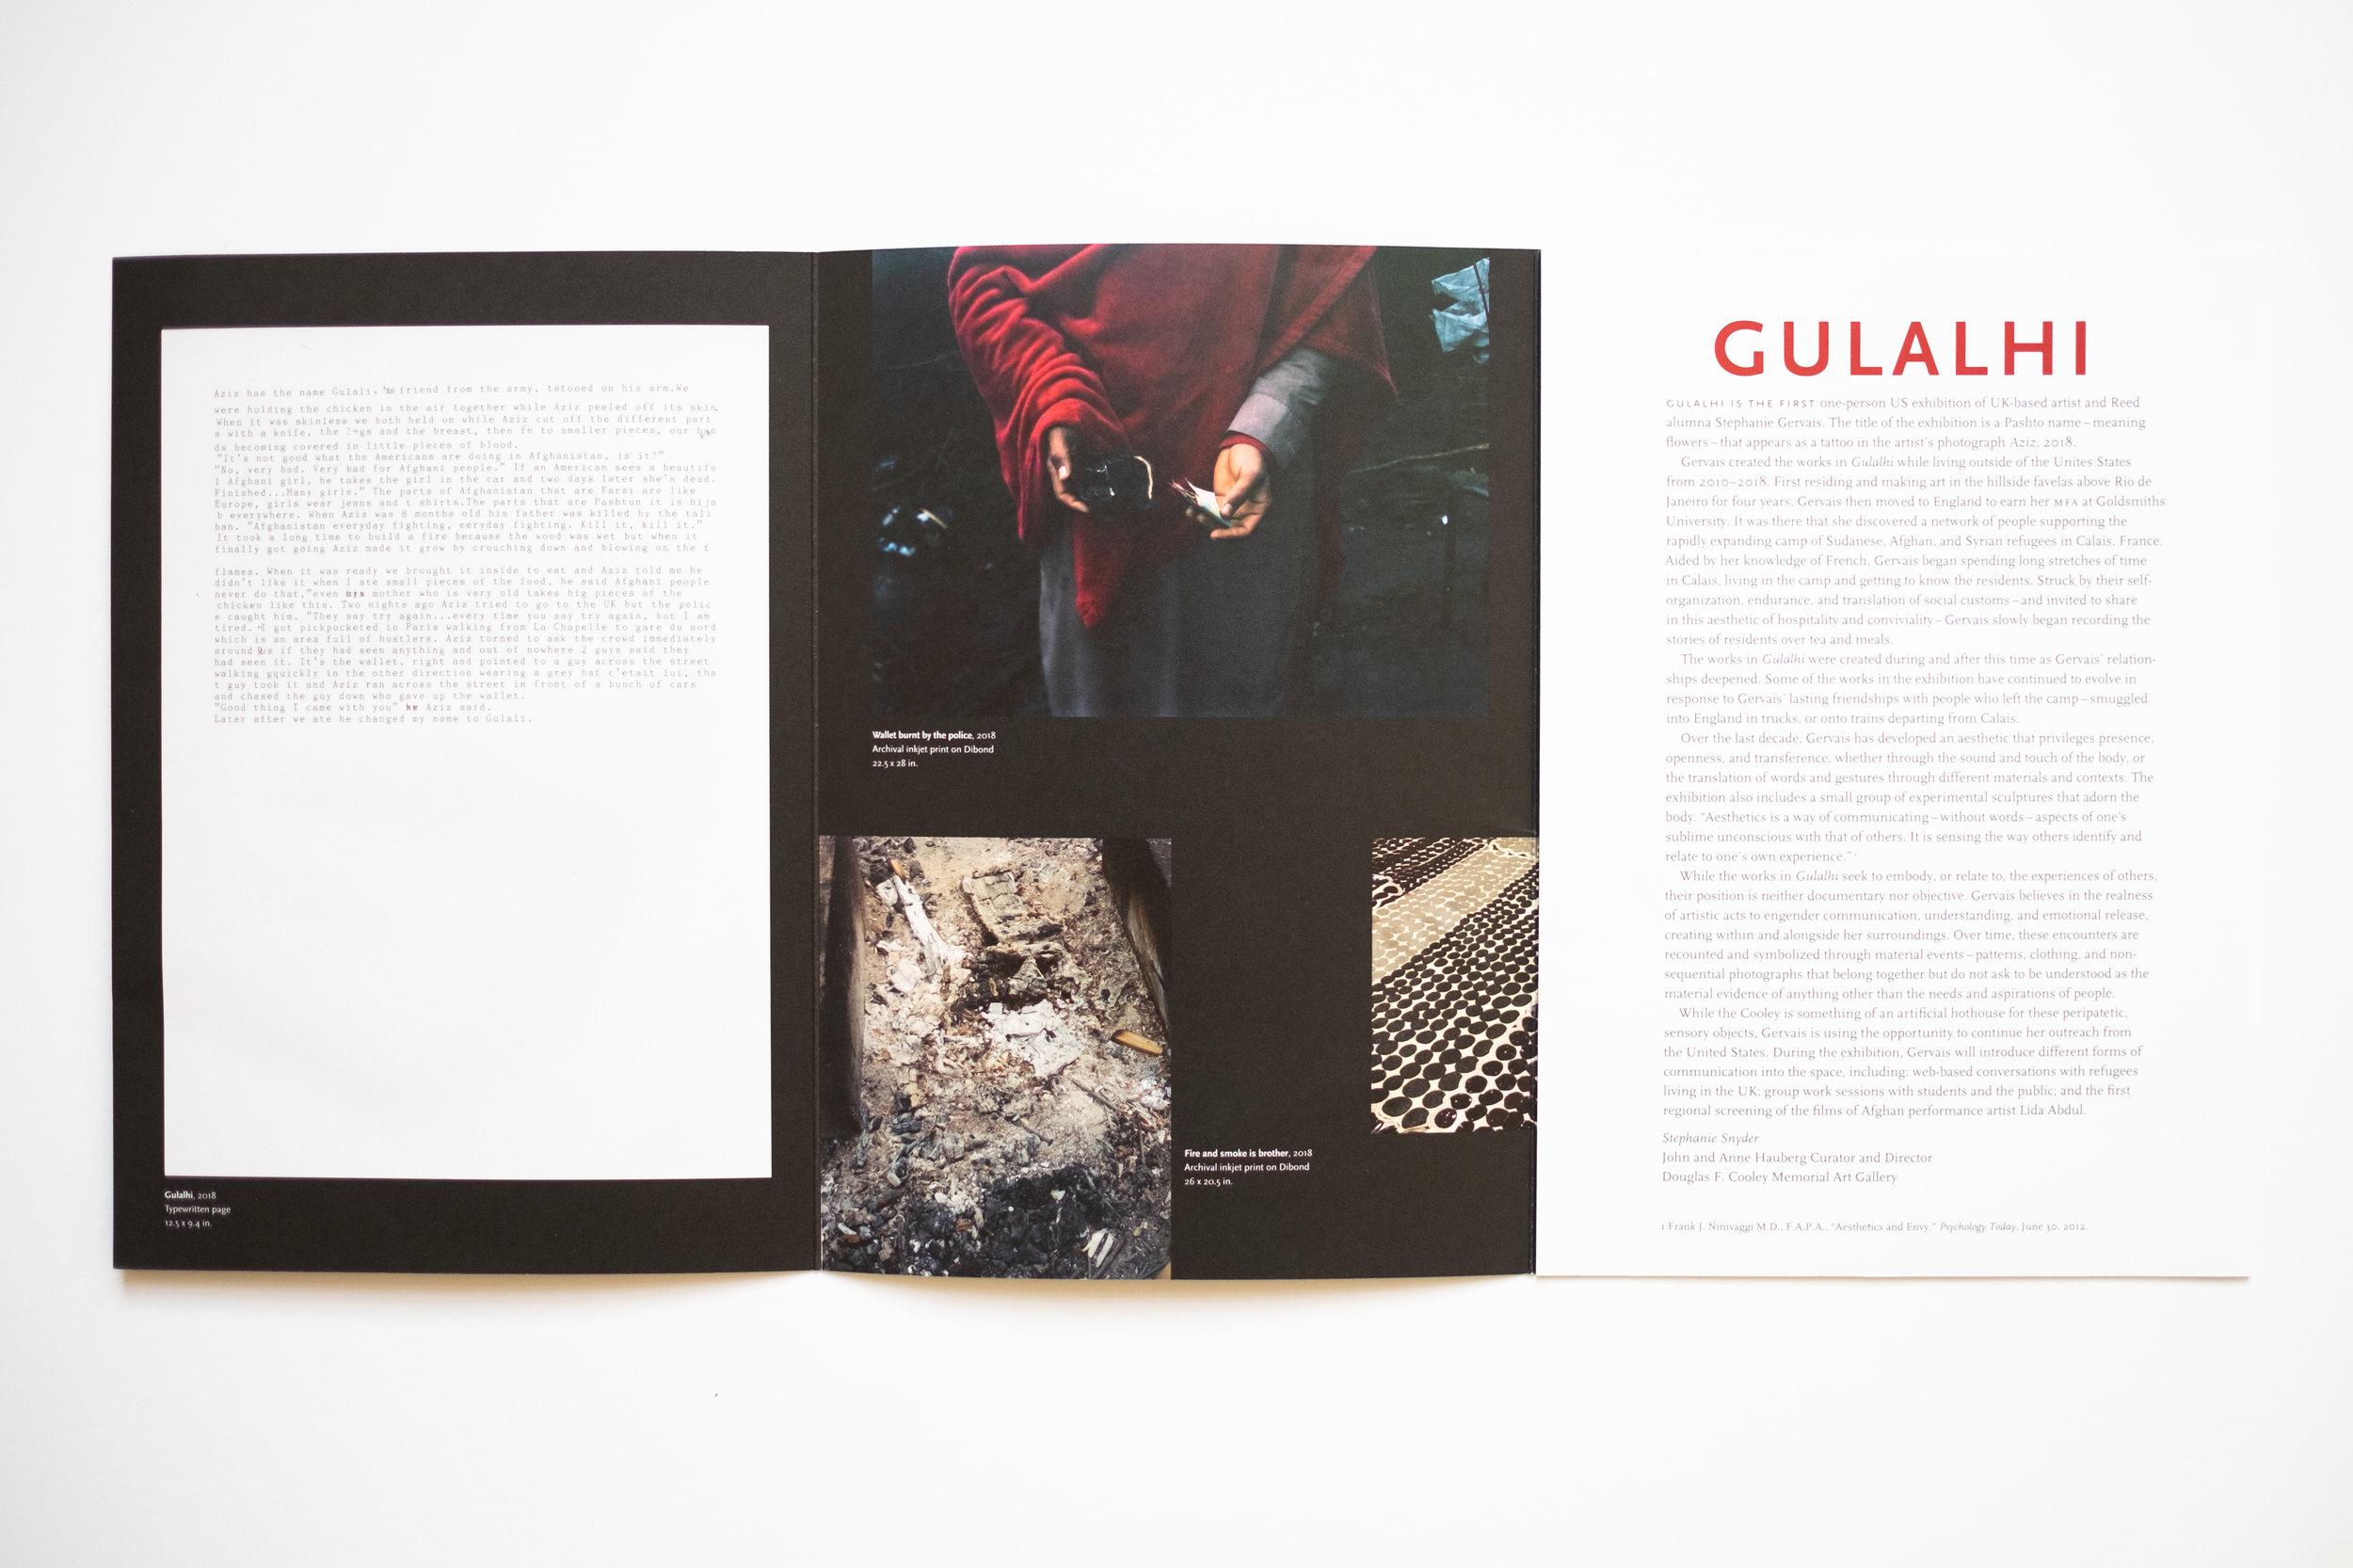 Gulalhi-Cooley-4.jpg